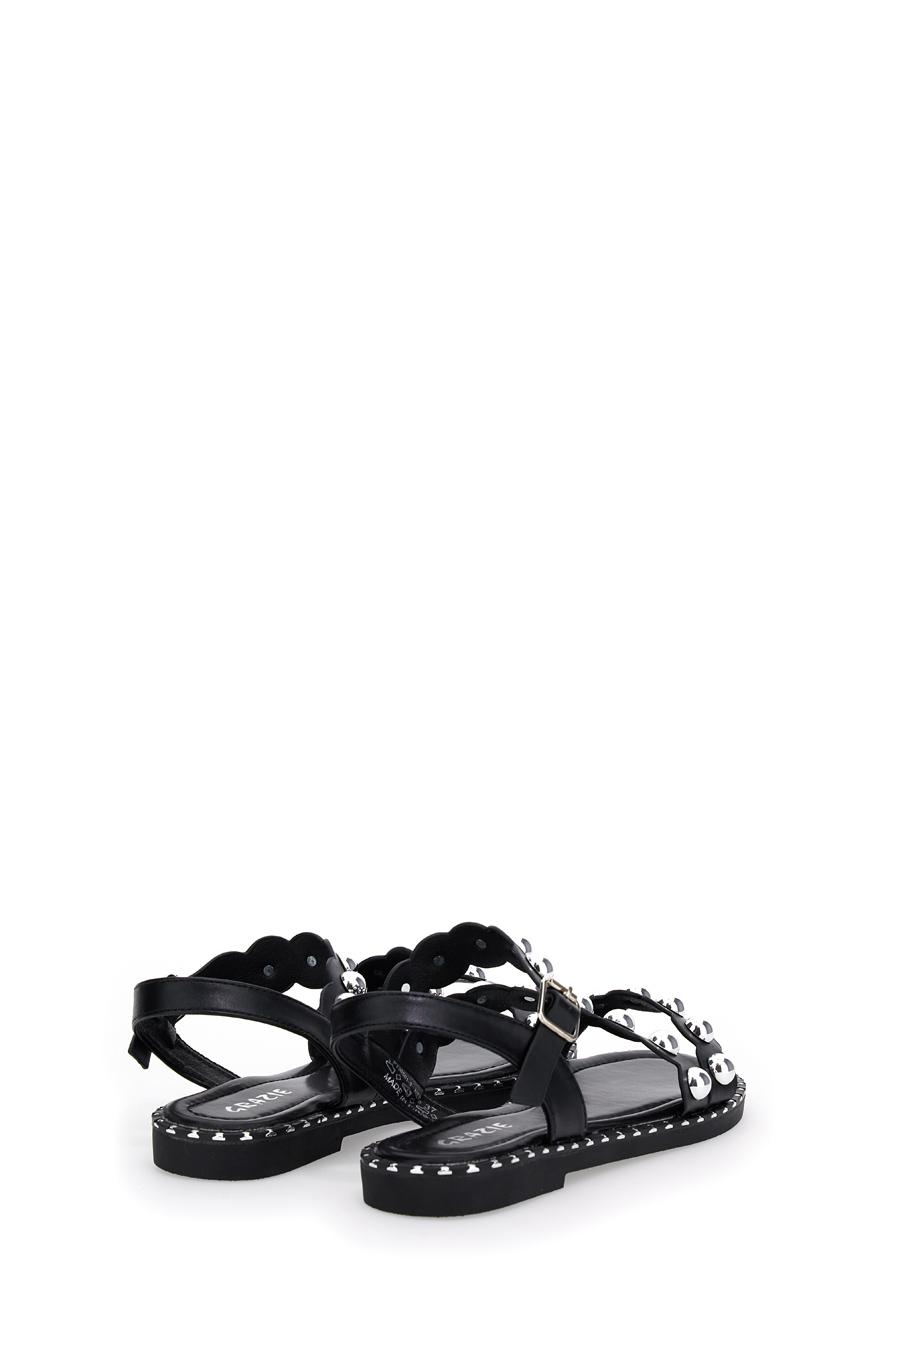 SANDALI donna nero GRAZIE 305013 | Pittarello